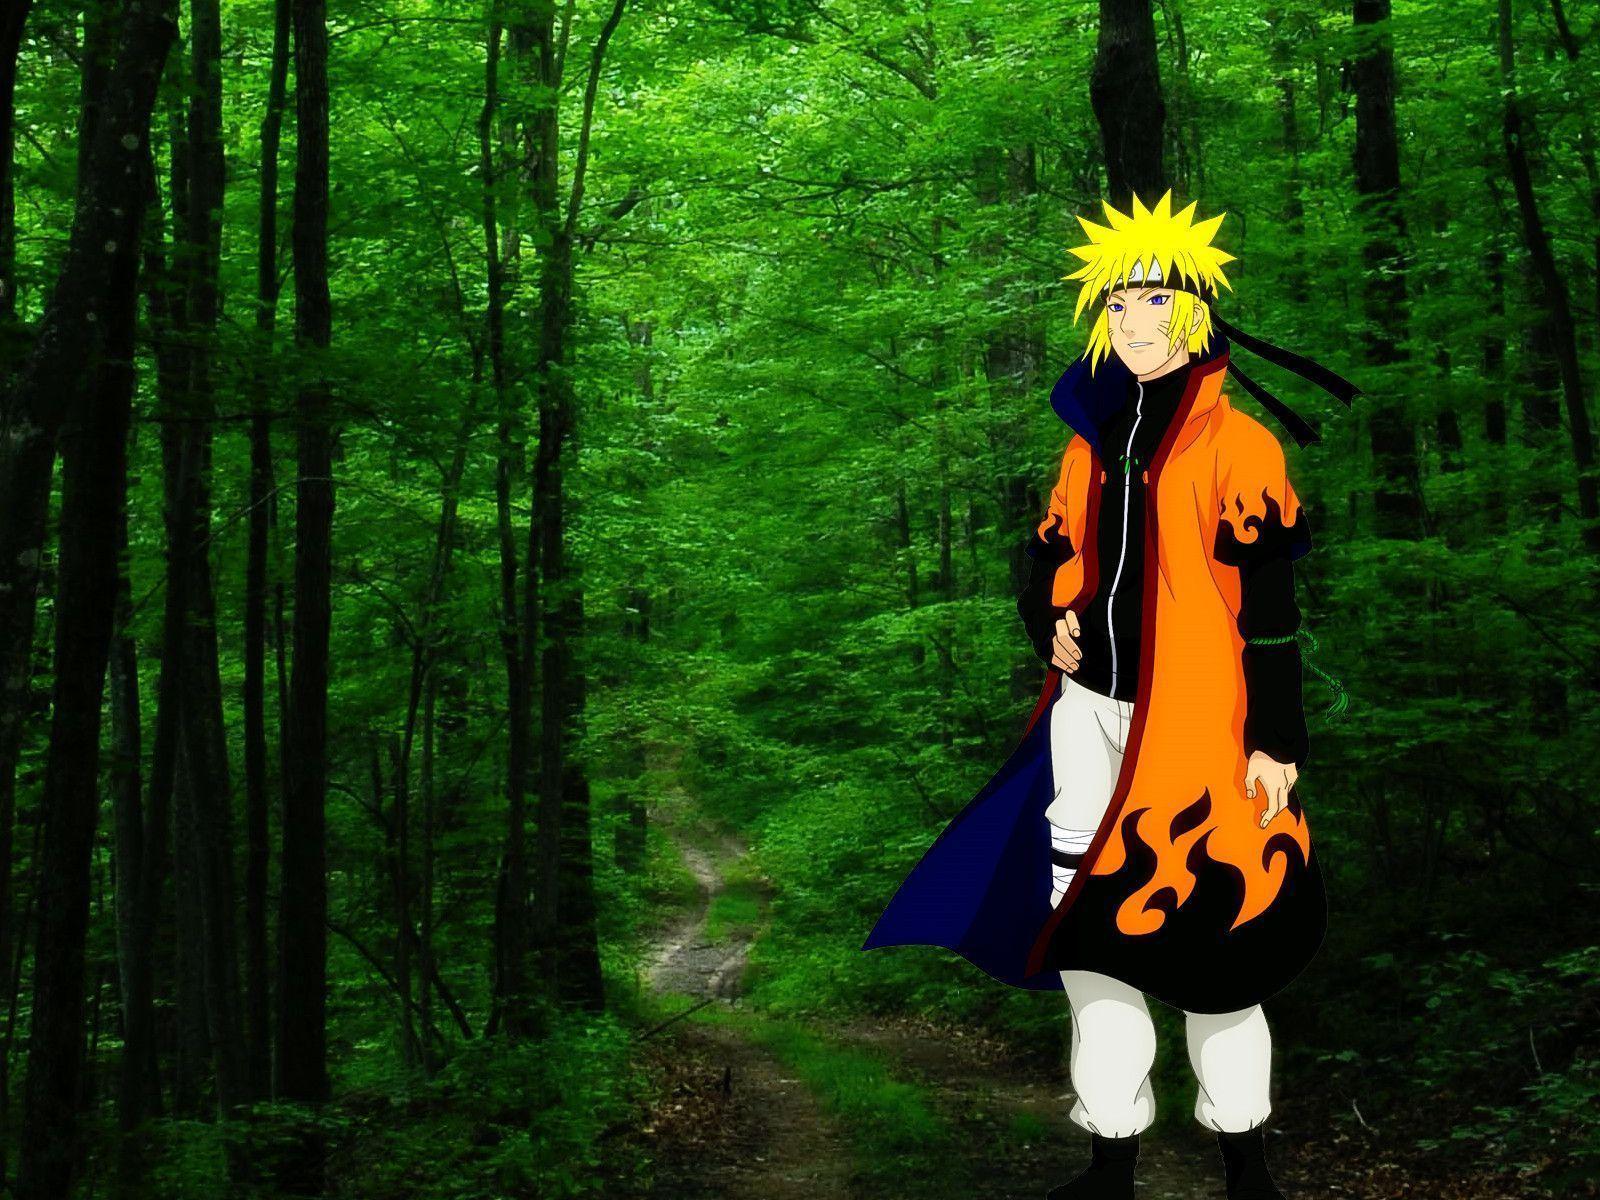 Naruto Shippuden Wallpapers Hokage Wallpaper Cave